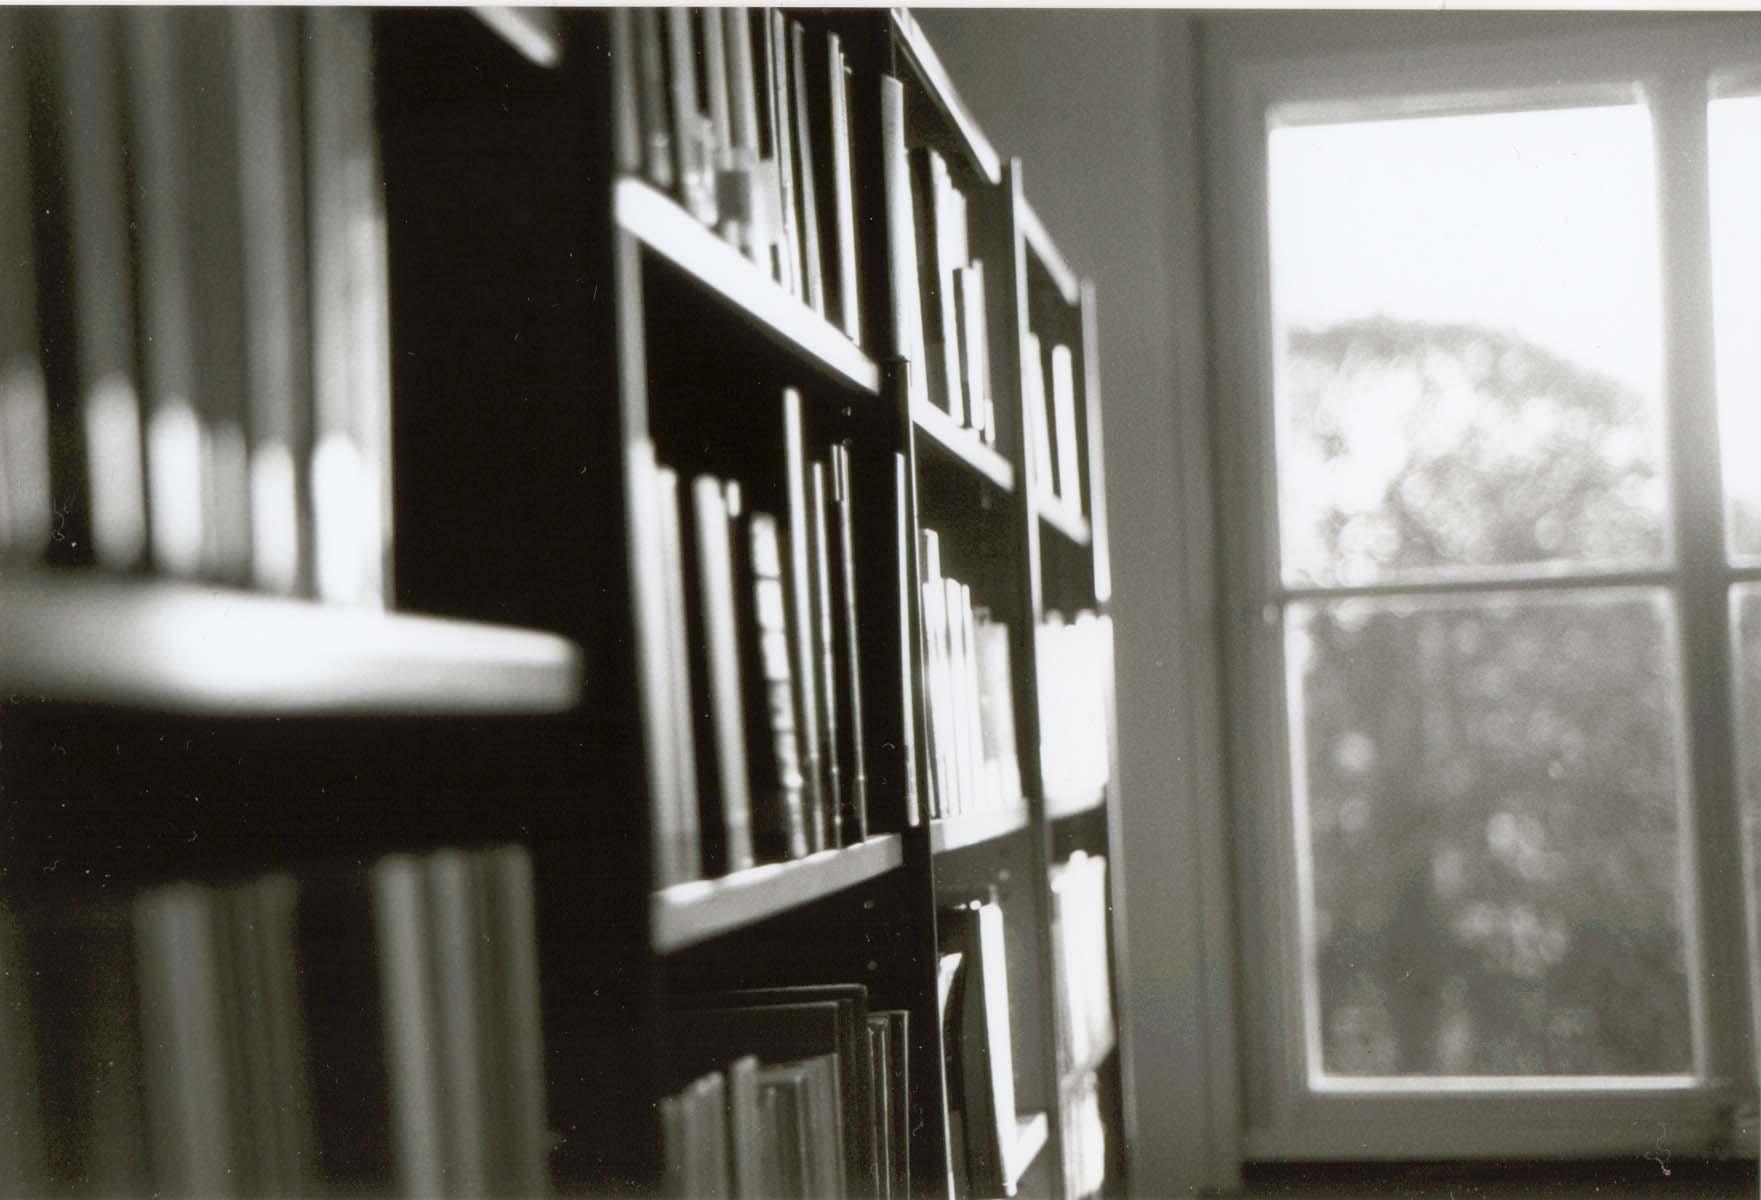 Dusty bookshelves at Utrecht University Library (photo by Andrea Hajek)